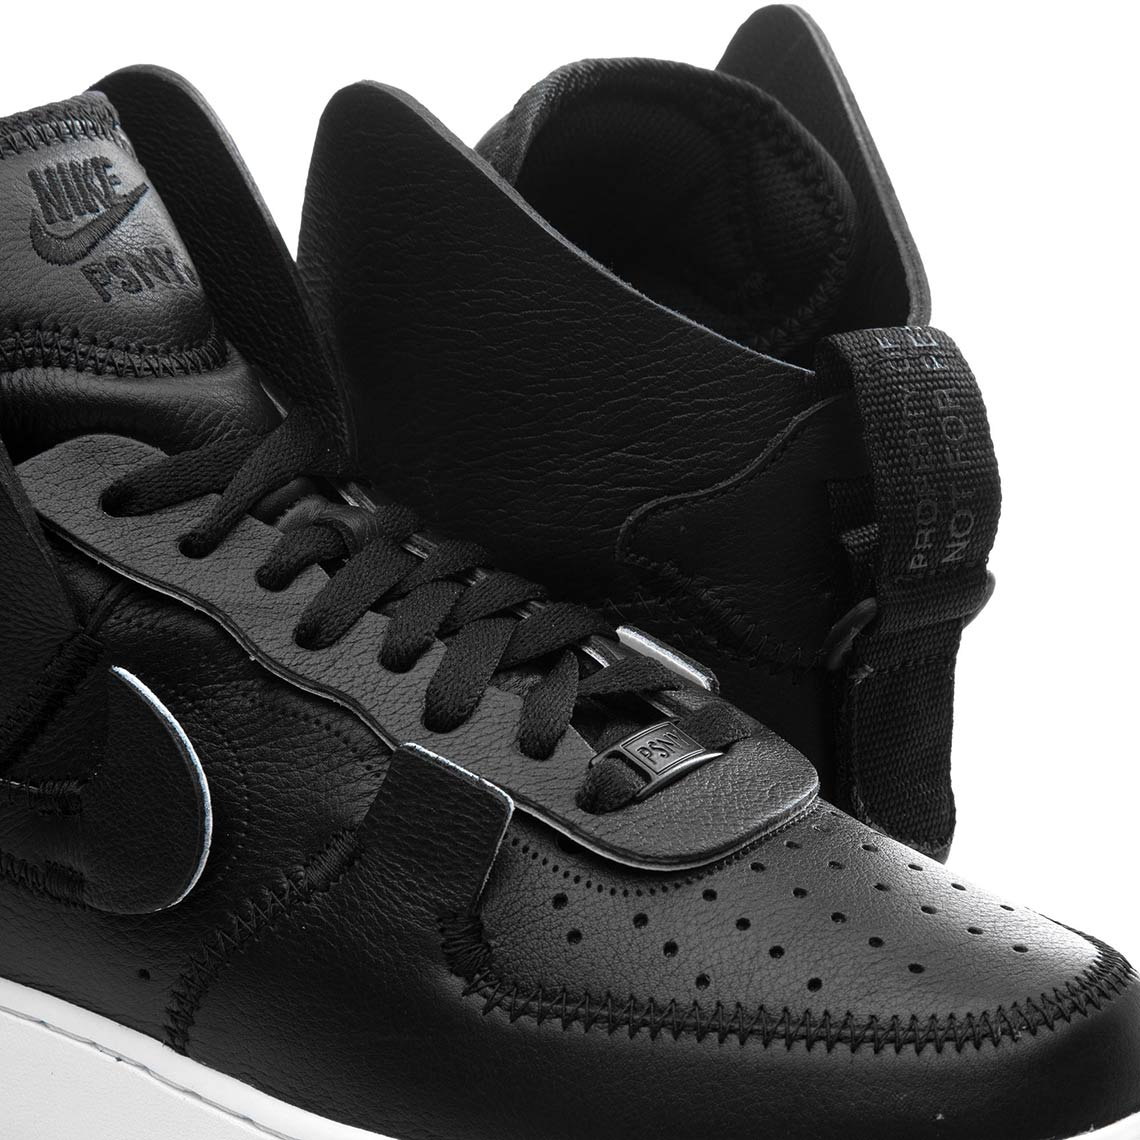 Psny Nike Air Force 1 High Black Ao9292 002 Sneakernews Com